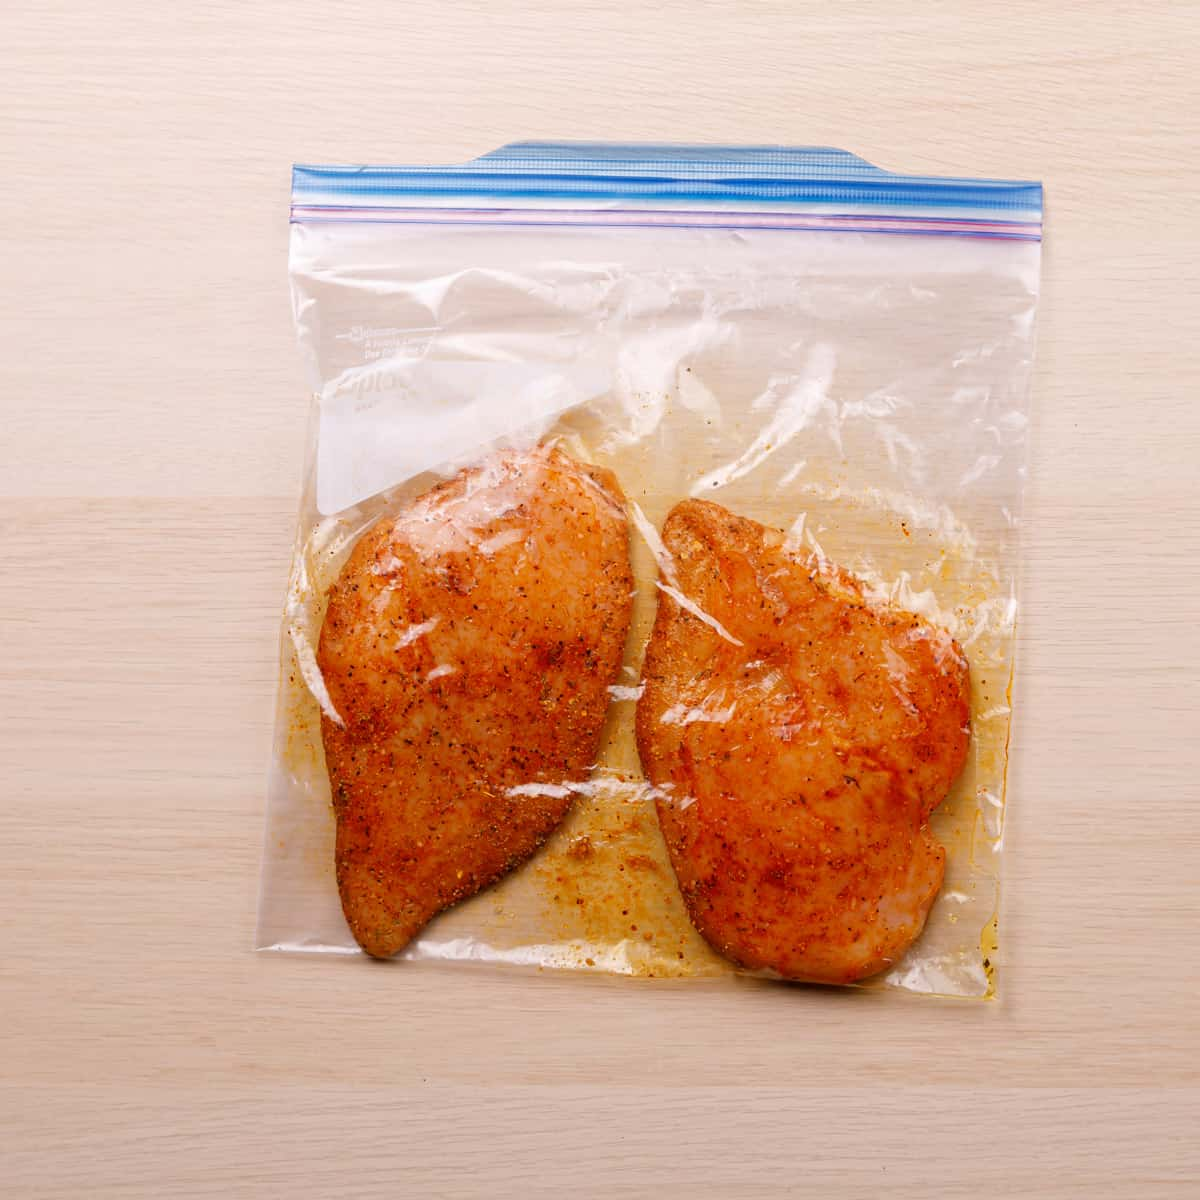 Chicken Breast with Cajun Seasoning